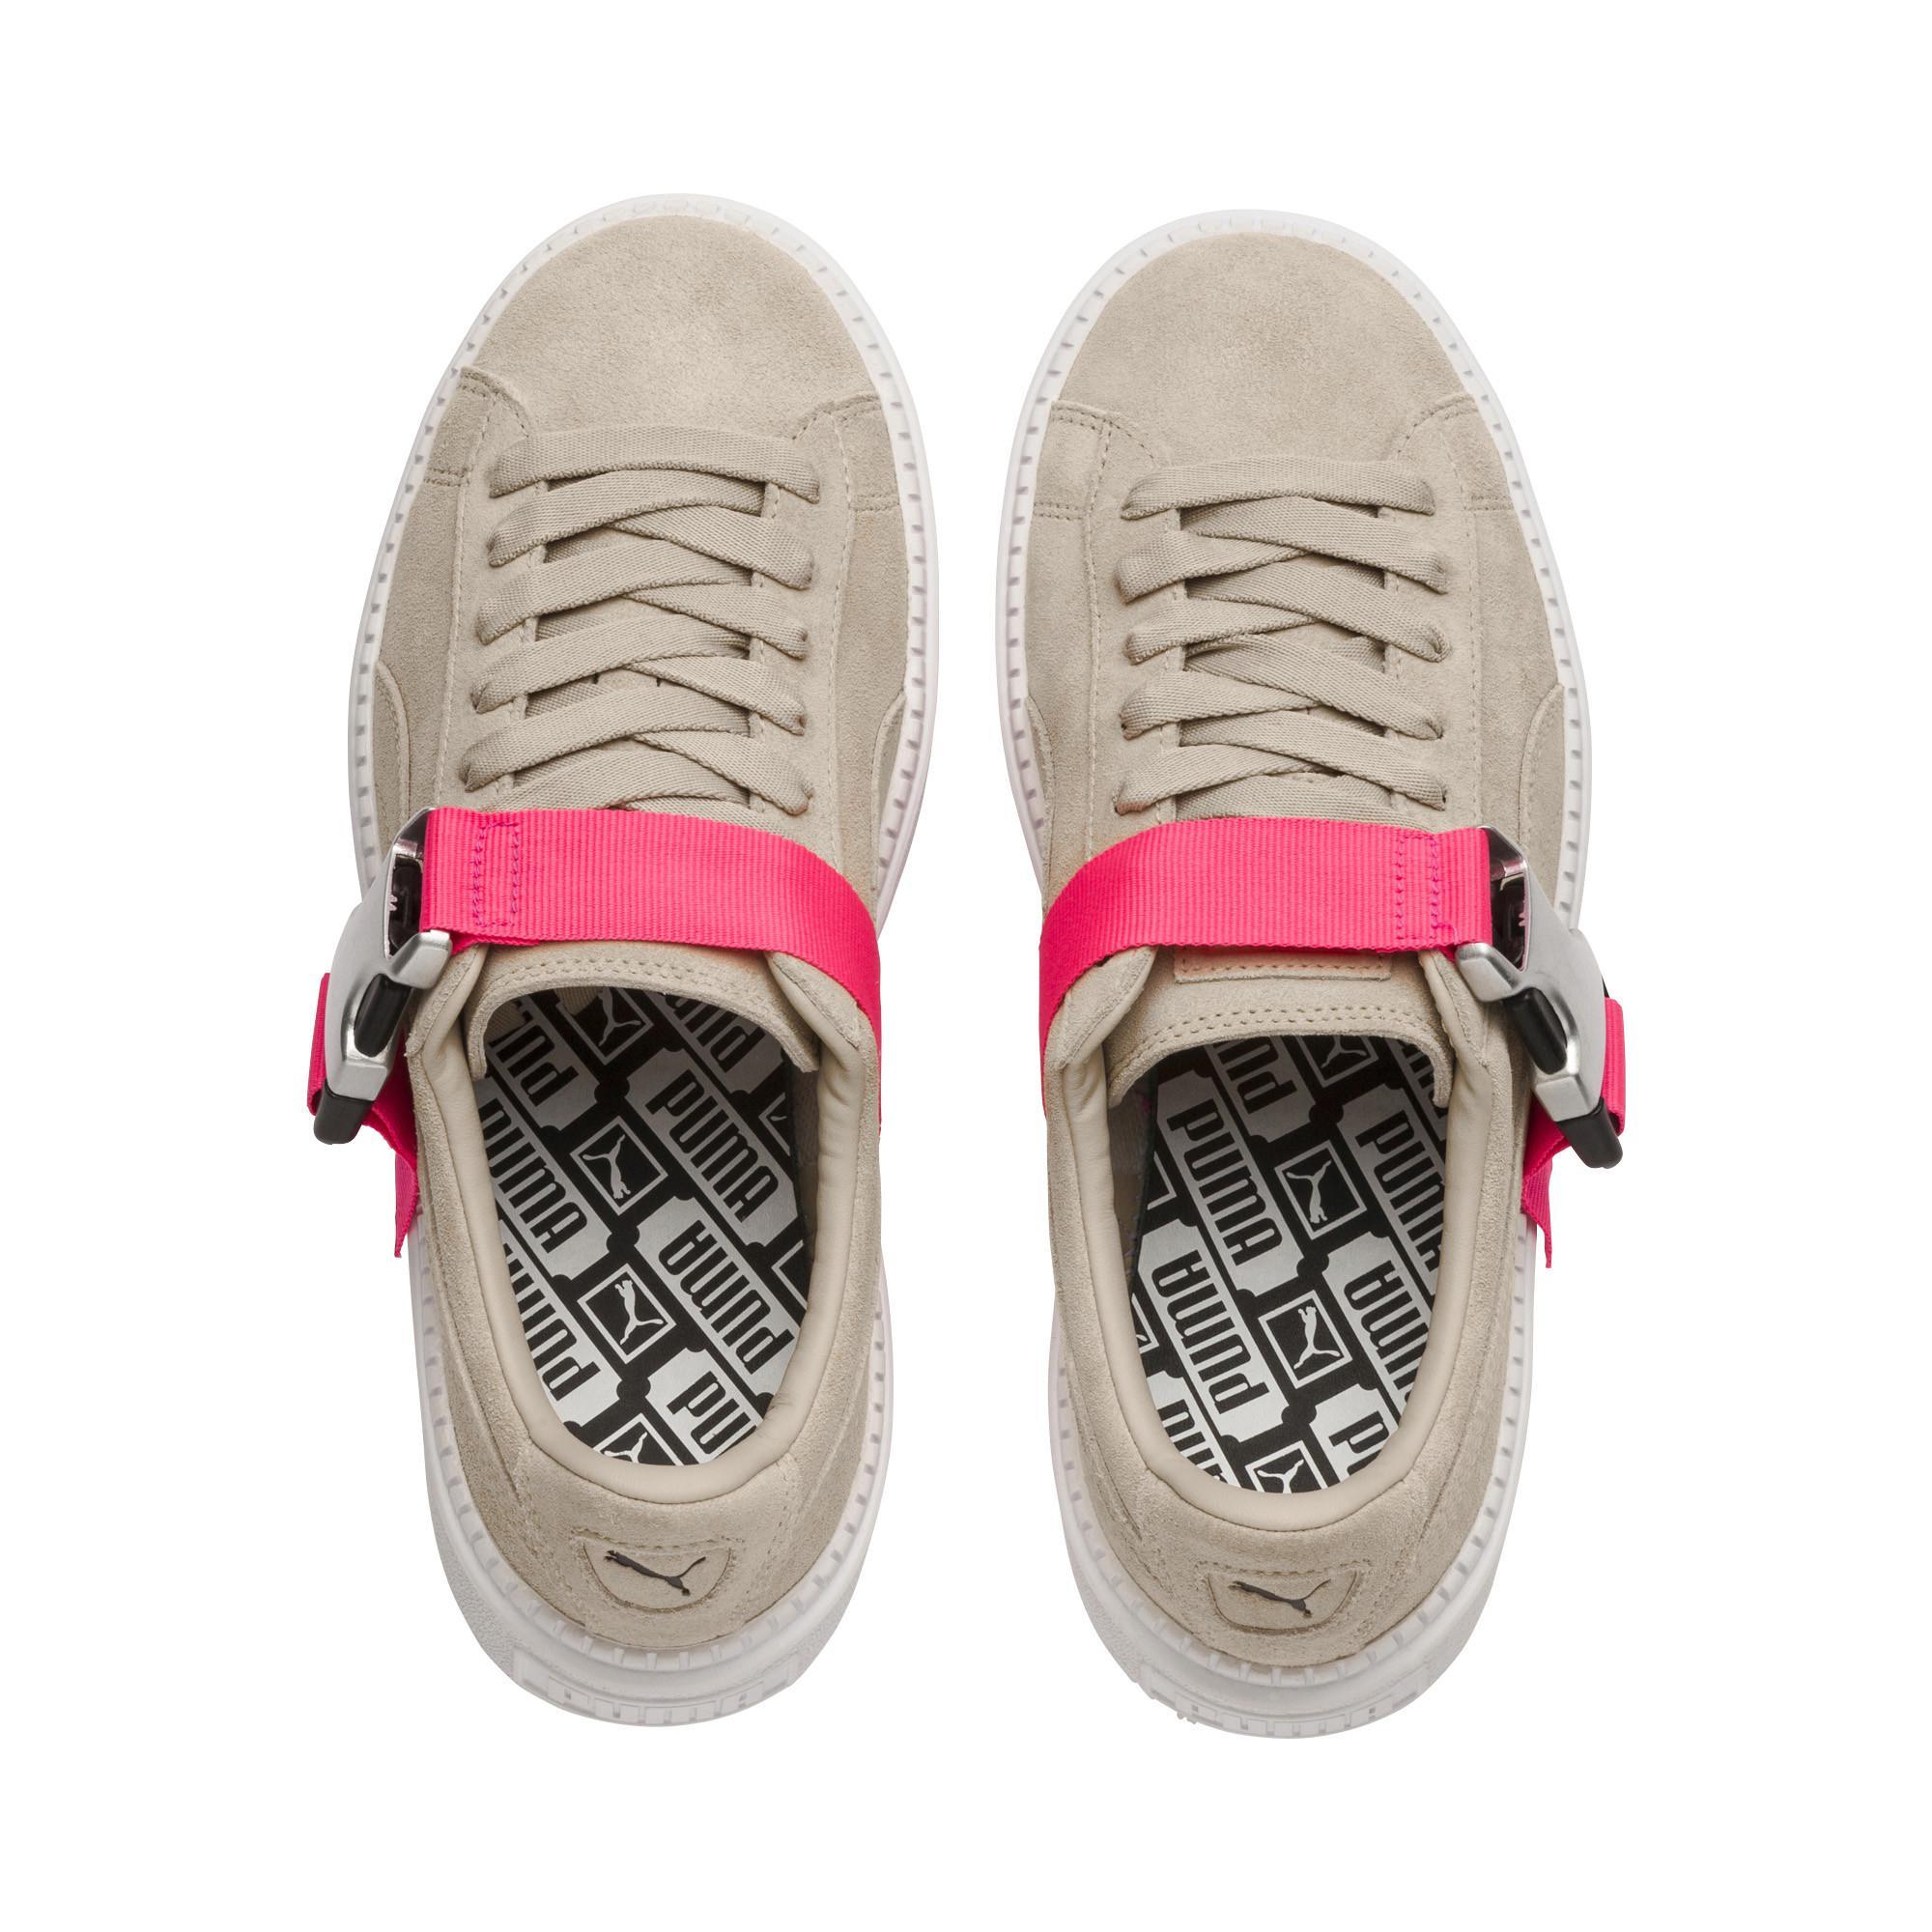 39c4c5348bbc PUMA - Multicolor Platform Trace Buckle Women s Sneakers - Lyst. View  fullscreen